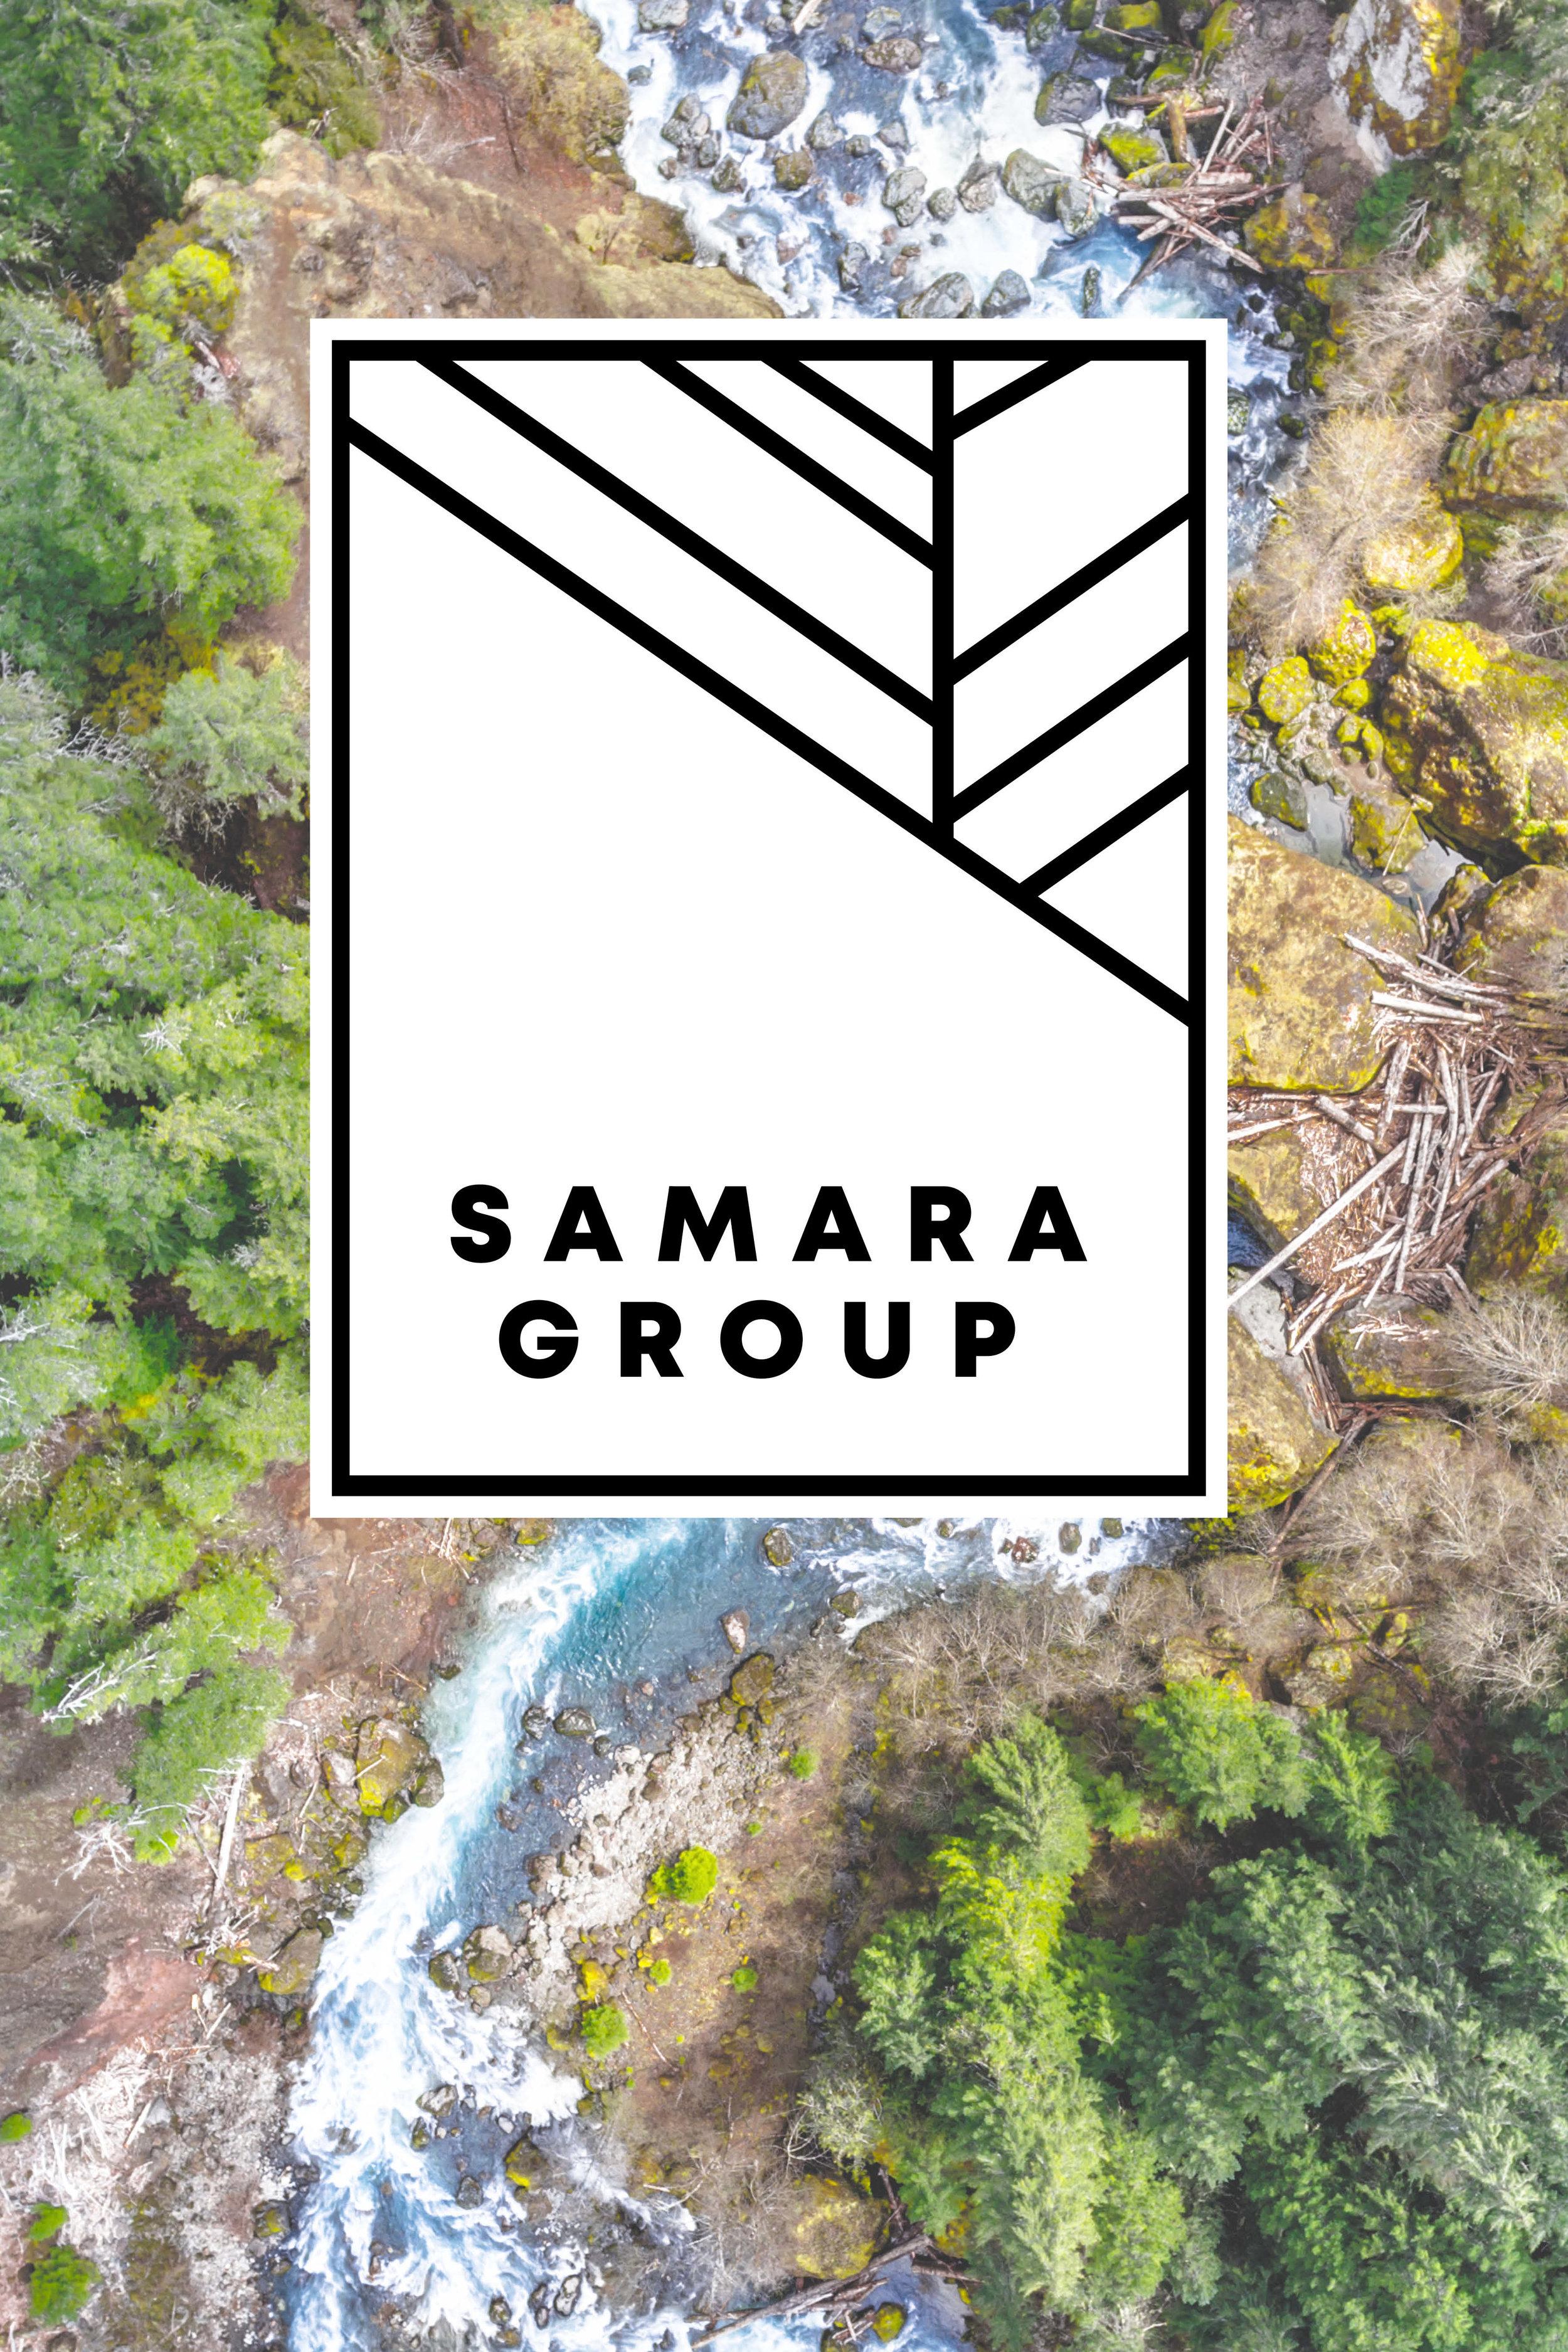 New logo and brand for Samara Group.